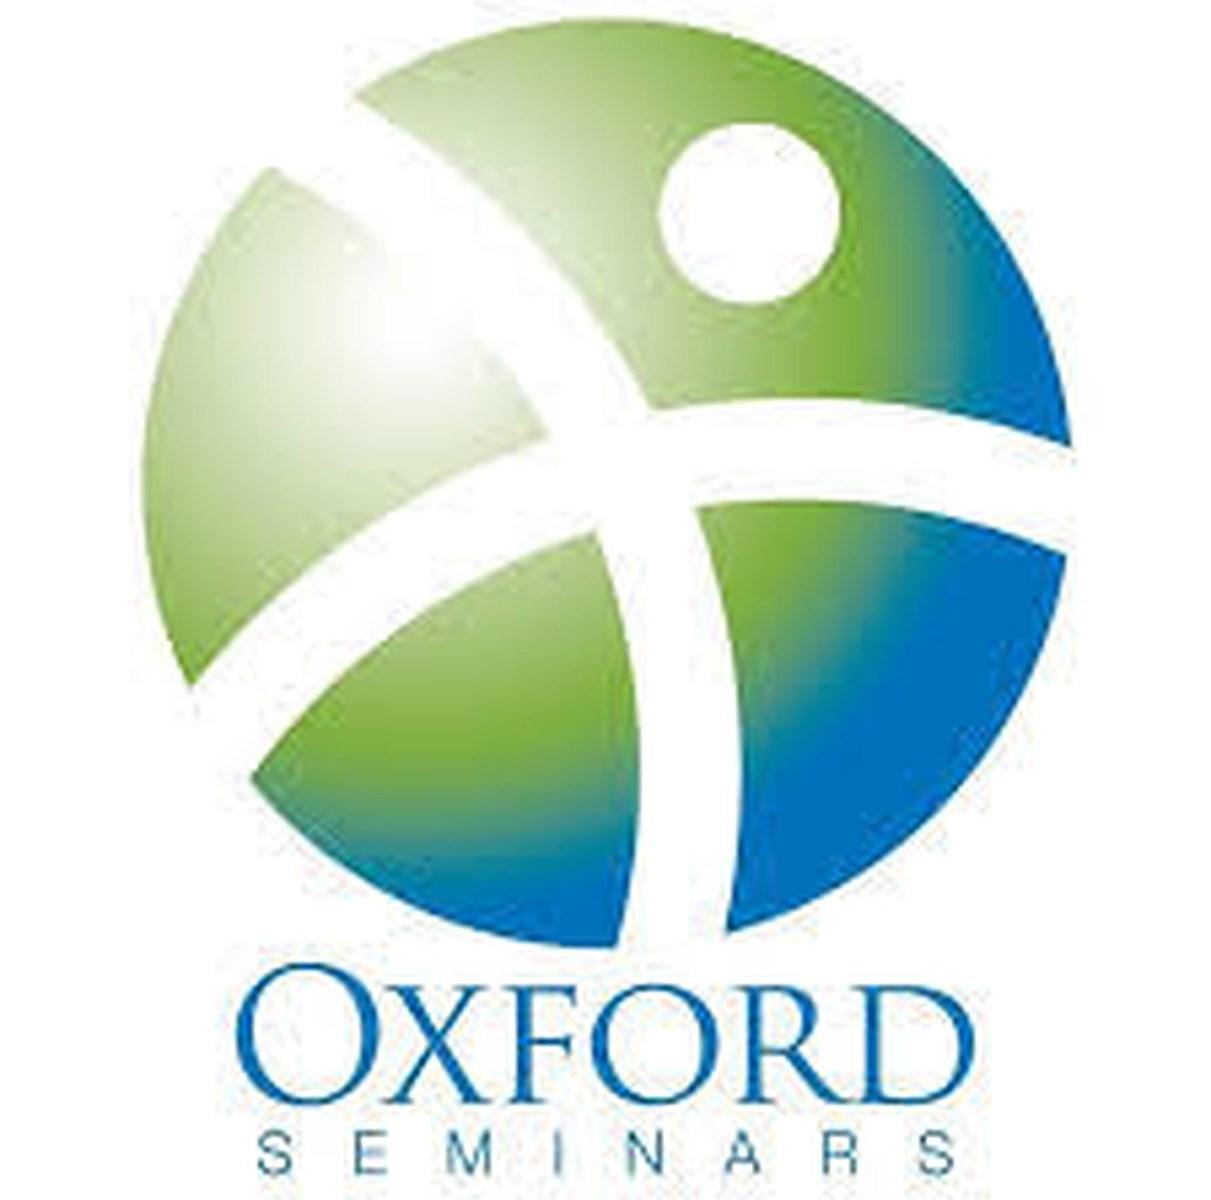 oxford-seminars-tesol-reviews-logo